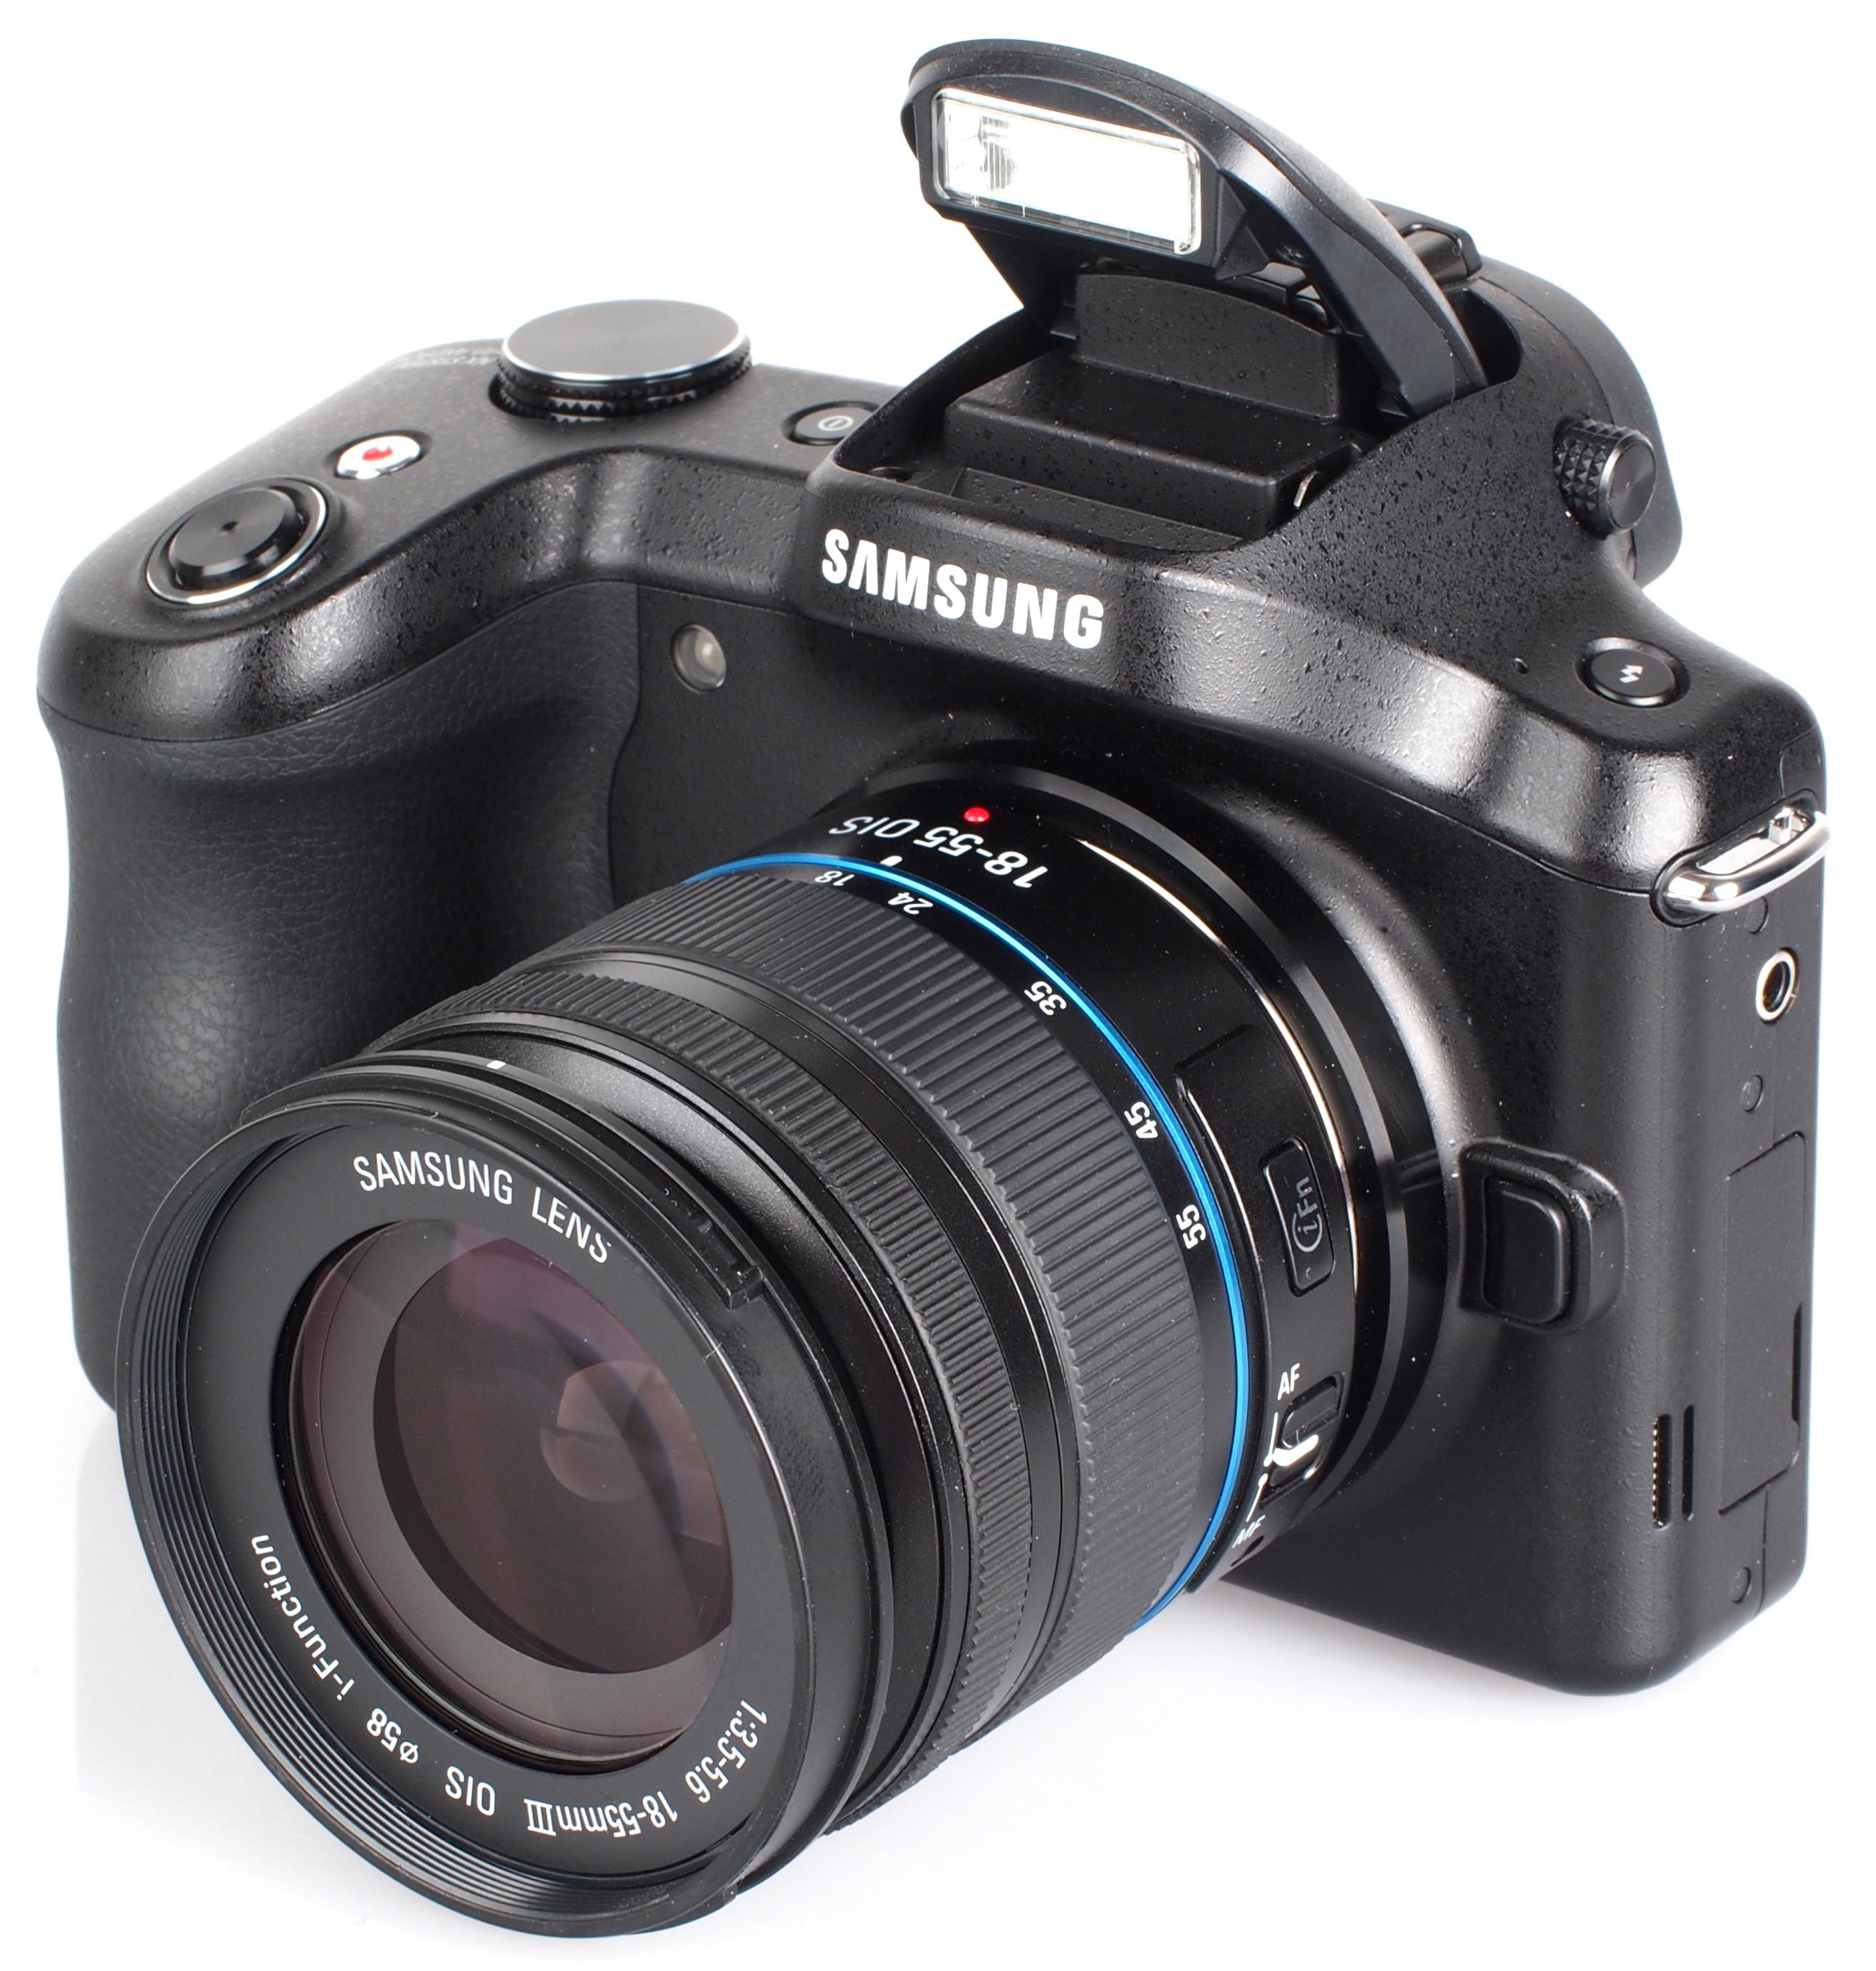 Elegant Sale Philippines Samsung Galaxy Nx Black Samsung Galaxy Nx Mirrorless Camera Review Samsung Nx Lenses Australia Samsung Nx Lenses dpreview Samsung Nx Lenses